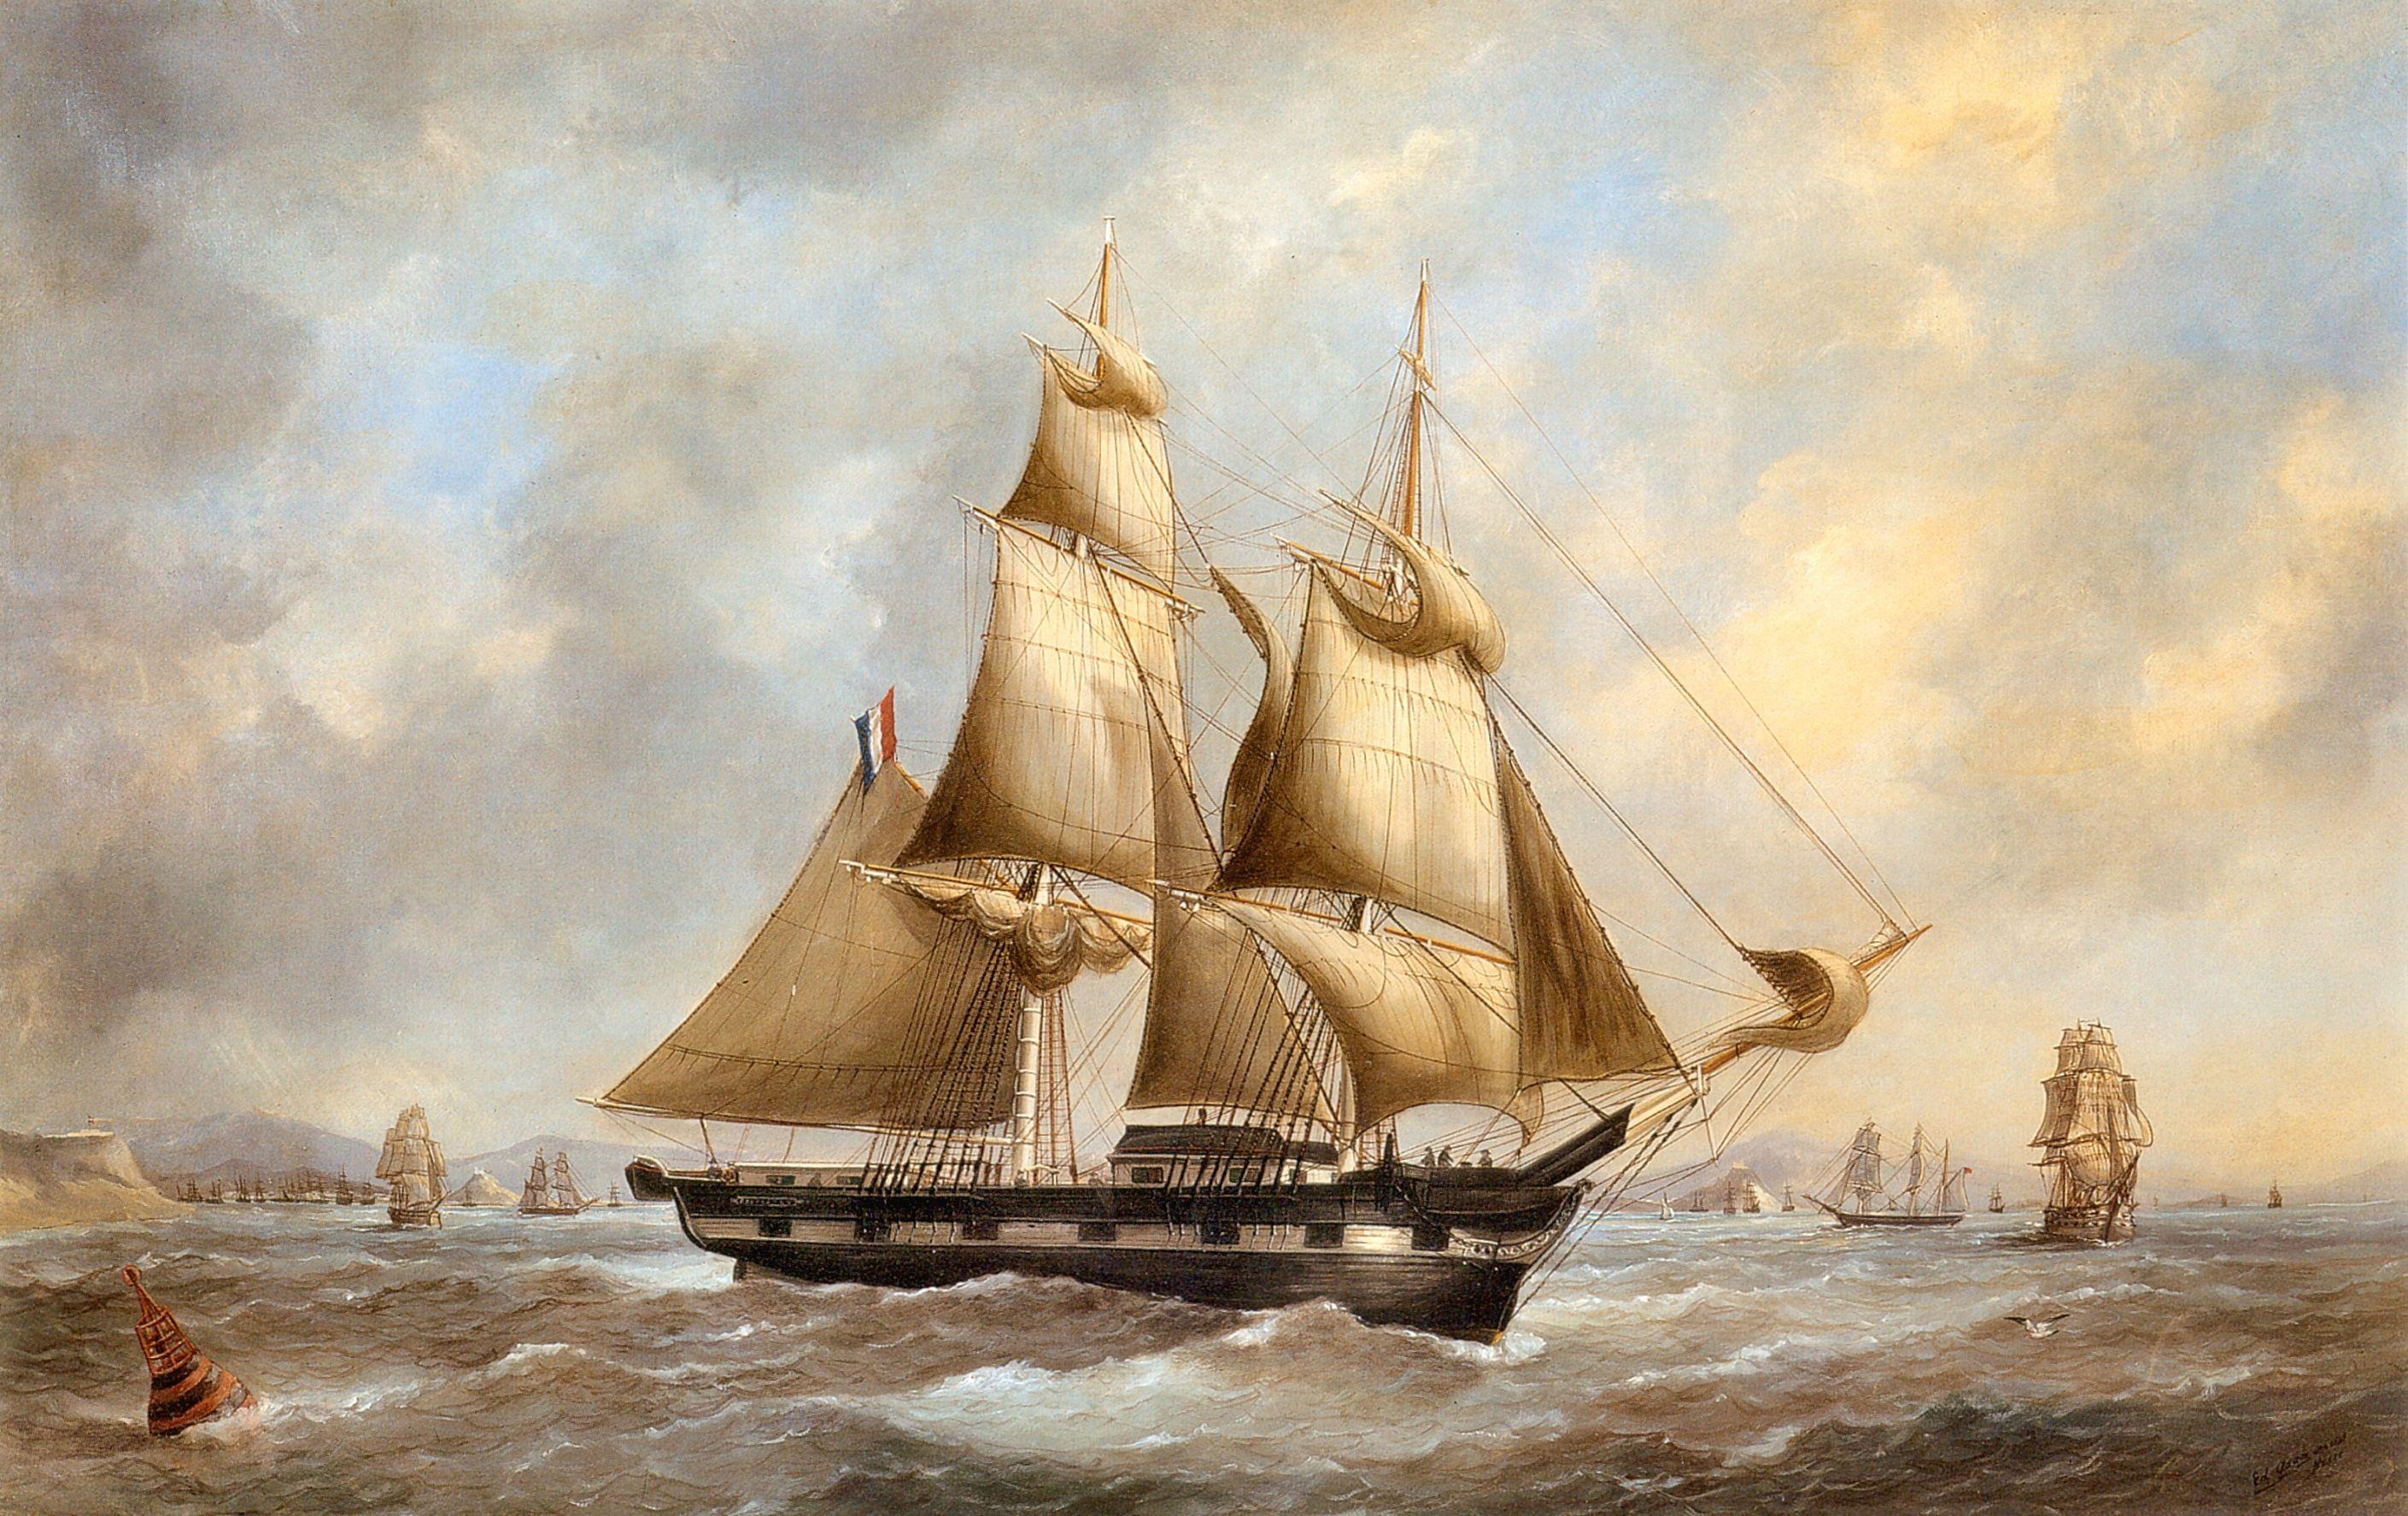 Картинки для декупажа корабли для печати на принтере